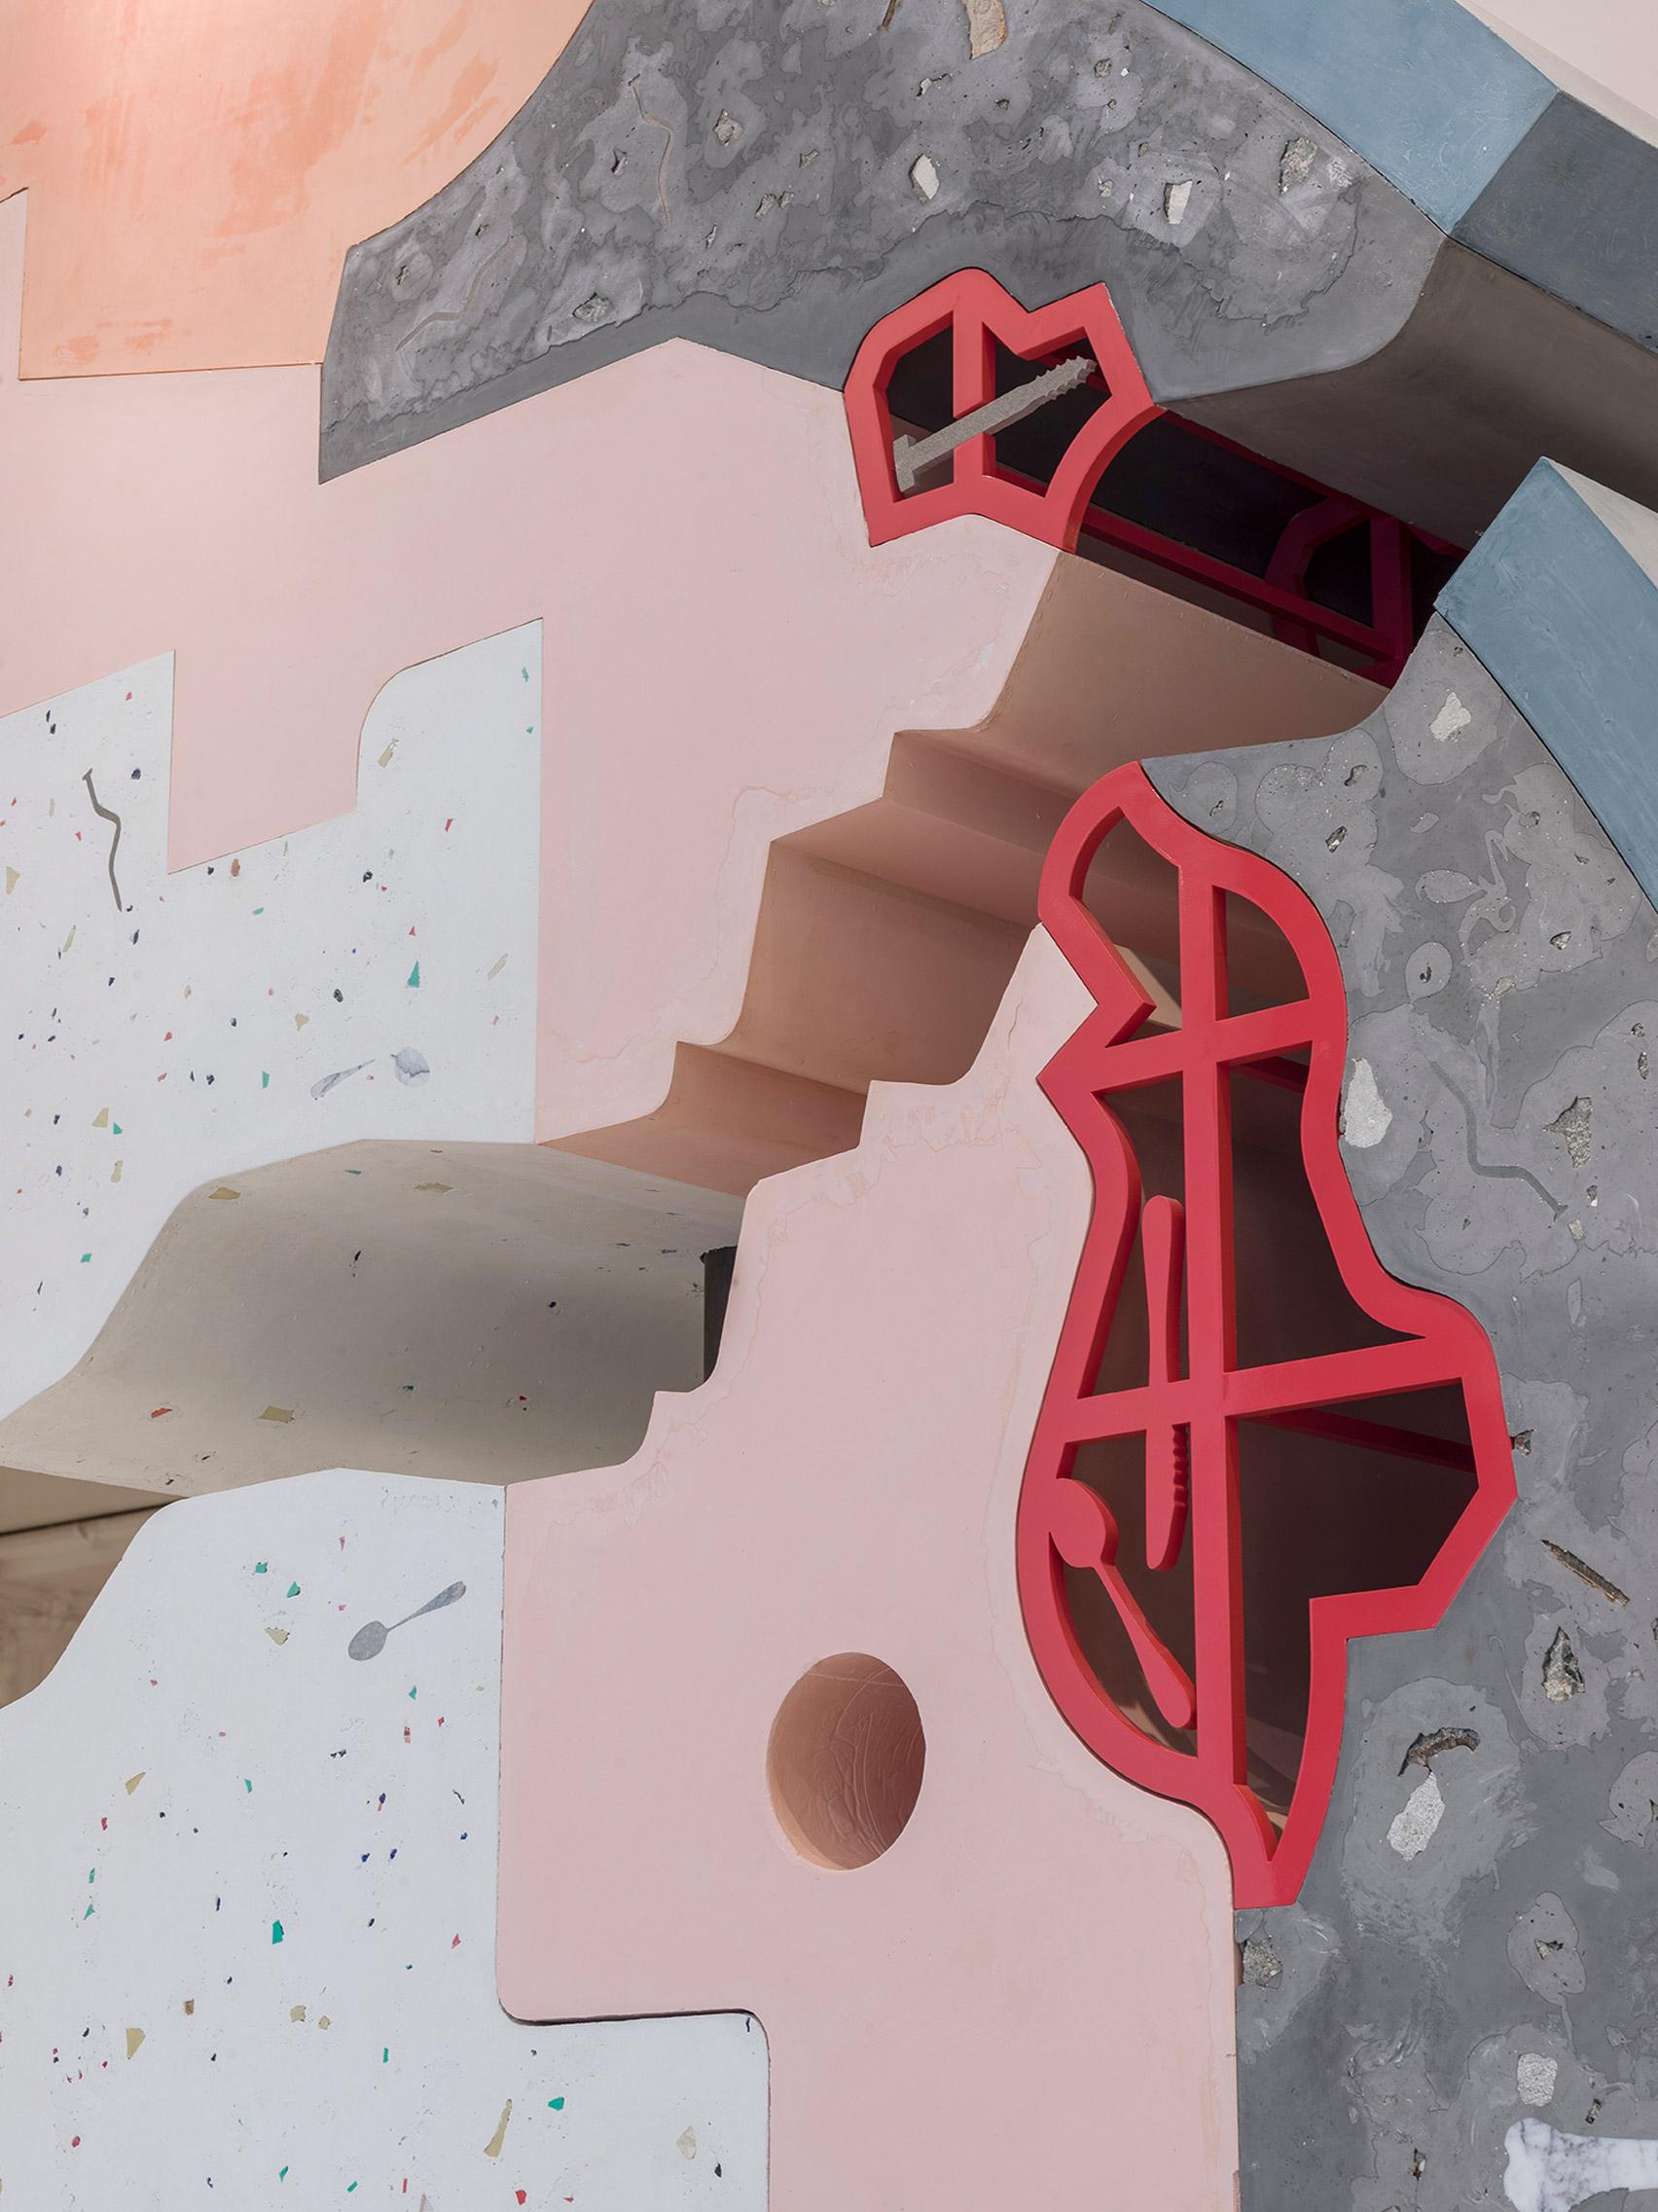 2019 Experimental Architecture Award shortlist